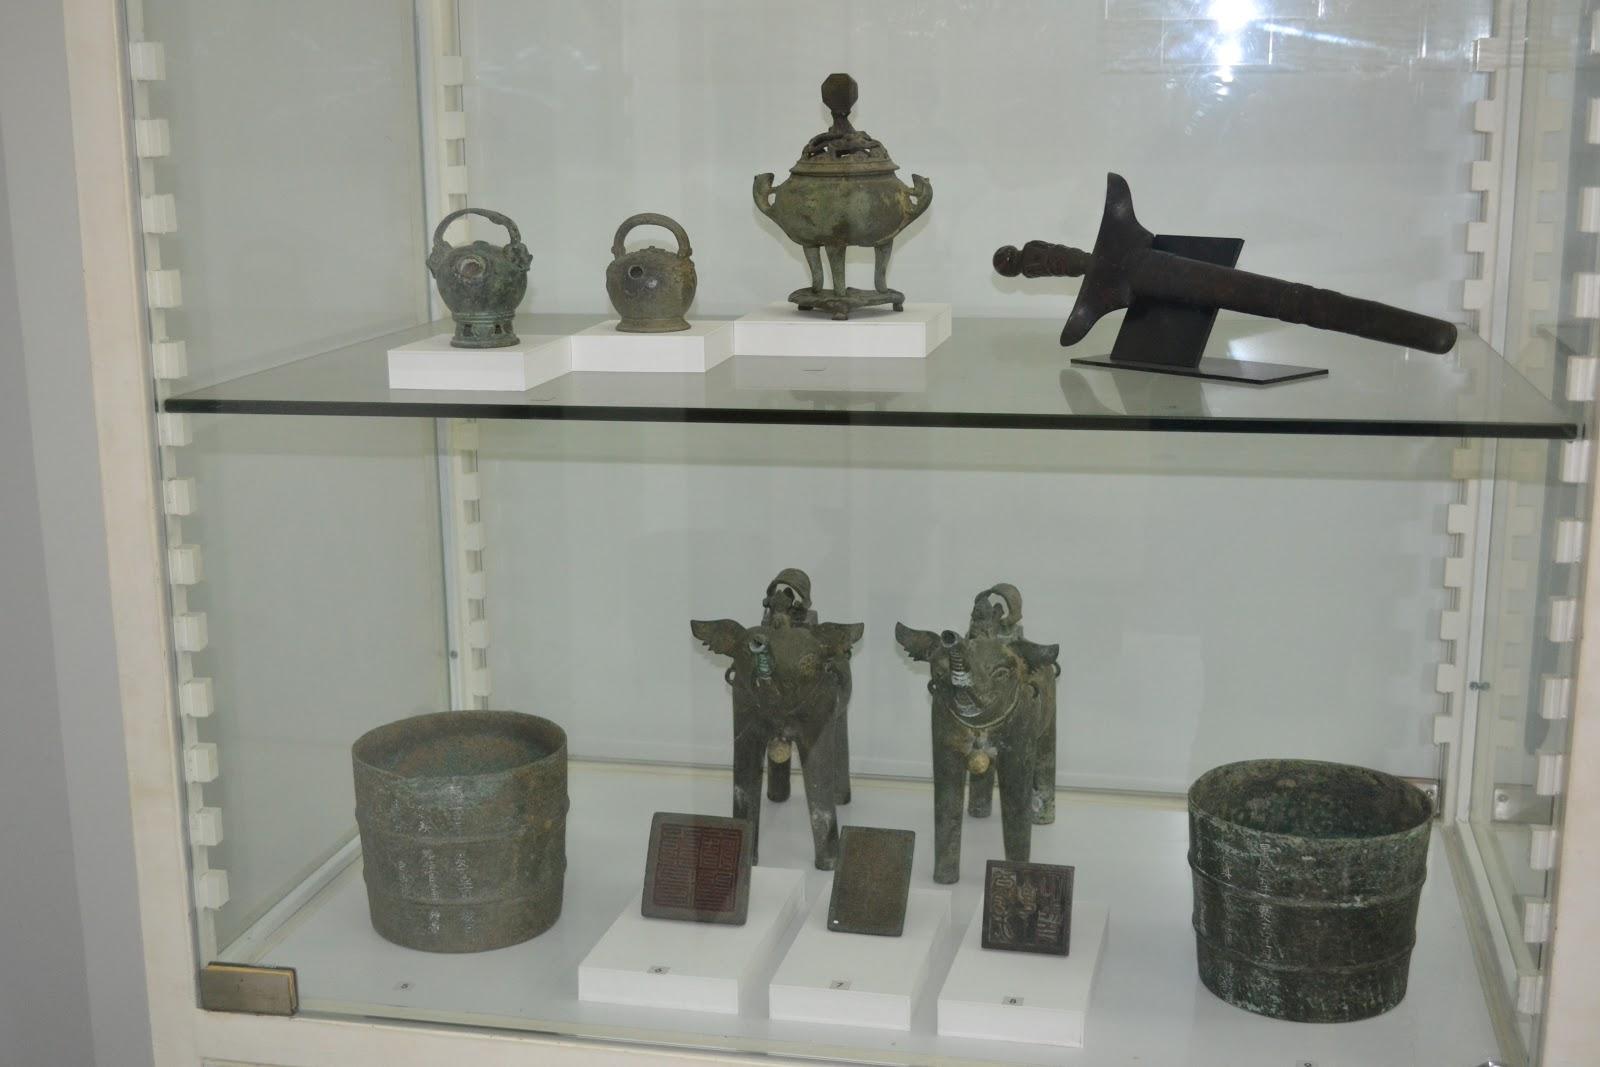 Artifact in museum